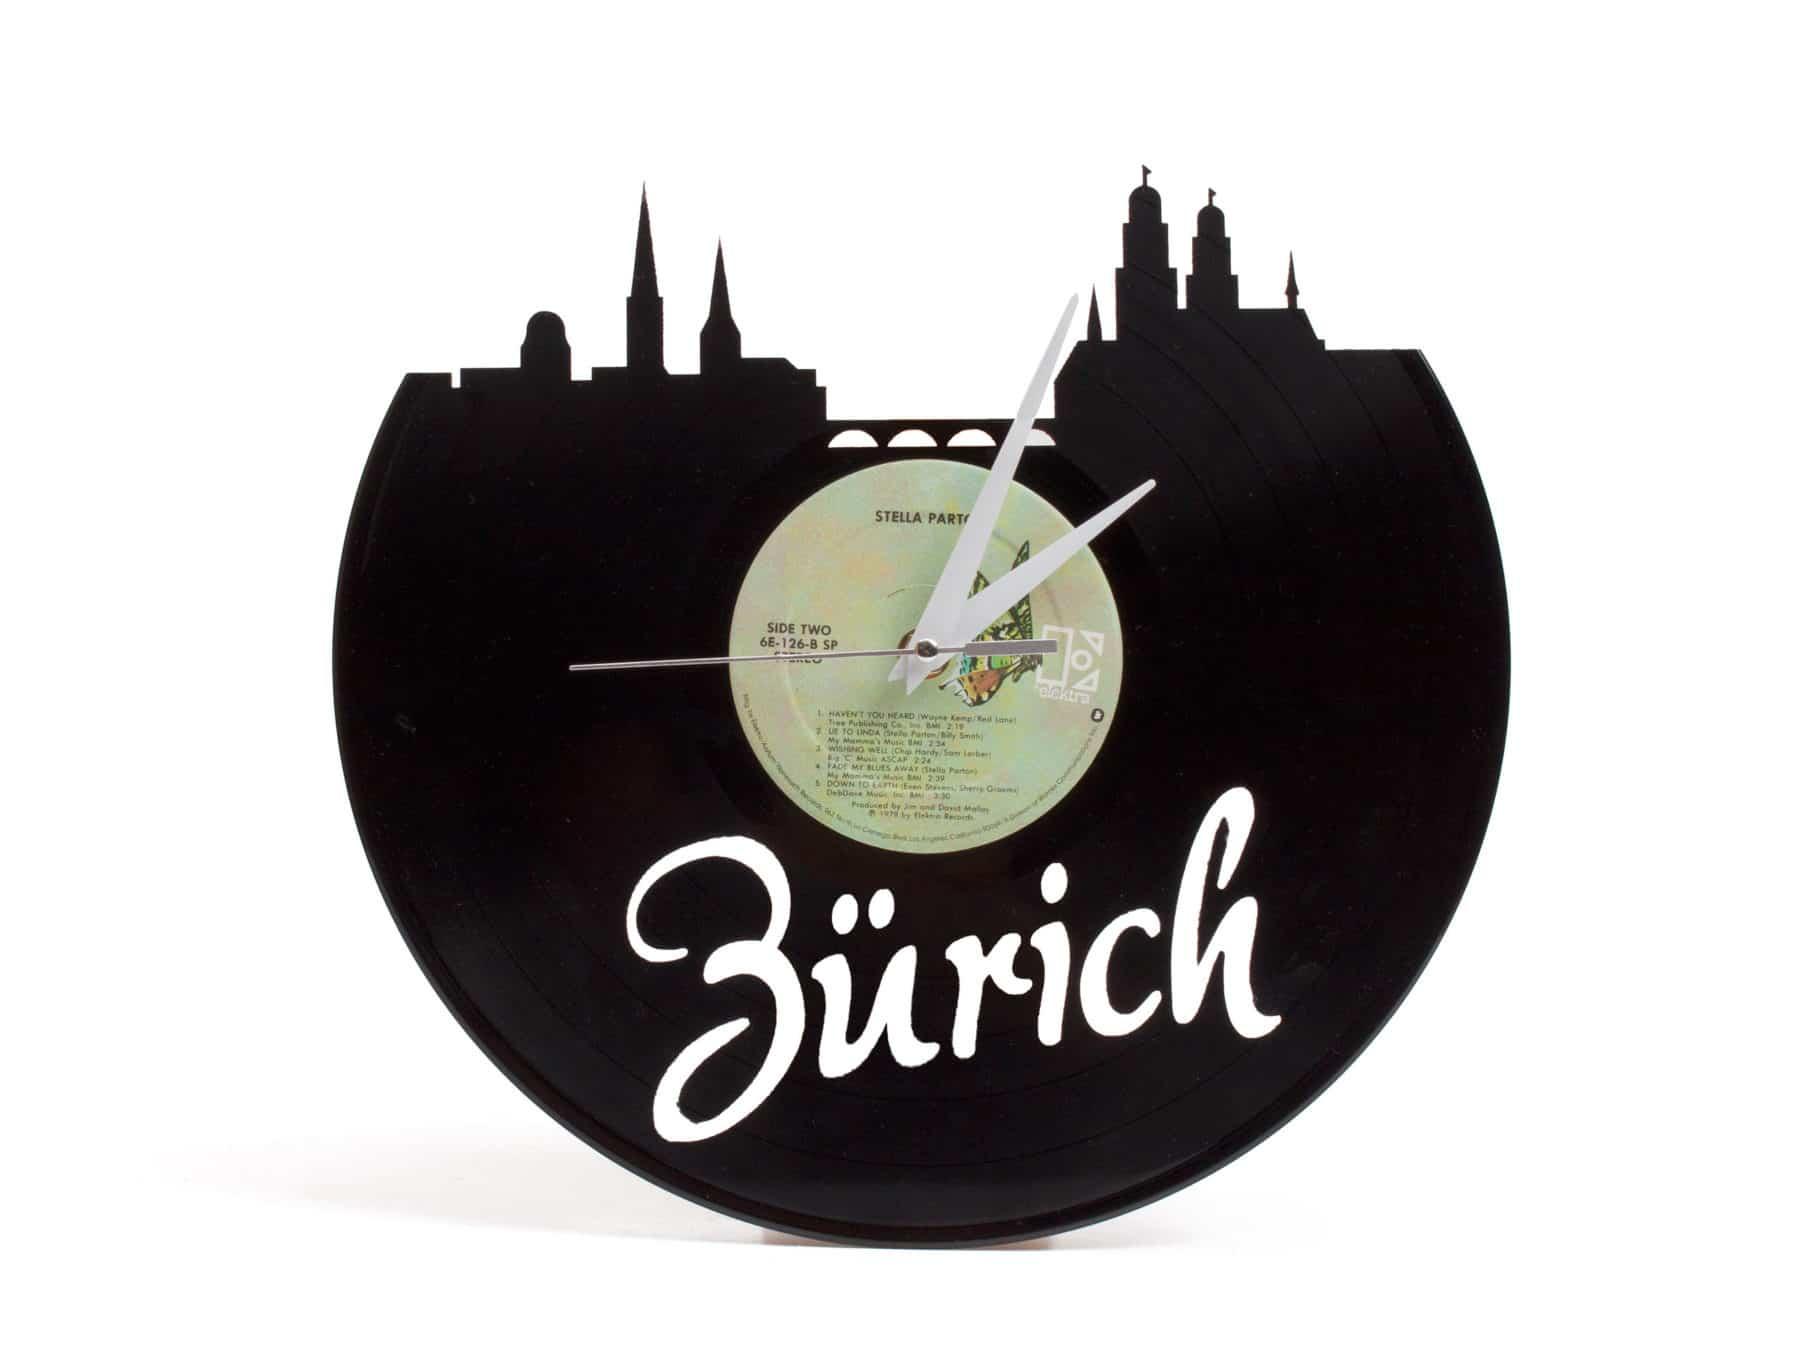 Schallplattenuhr Zuerich Schweiz Upcycling Recycling KURTS.ch